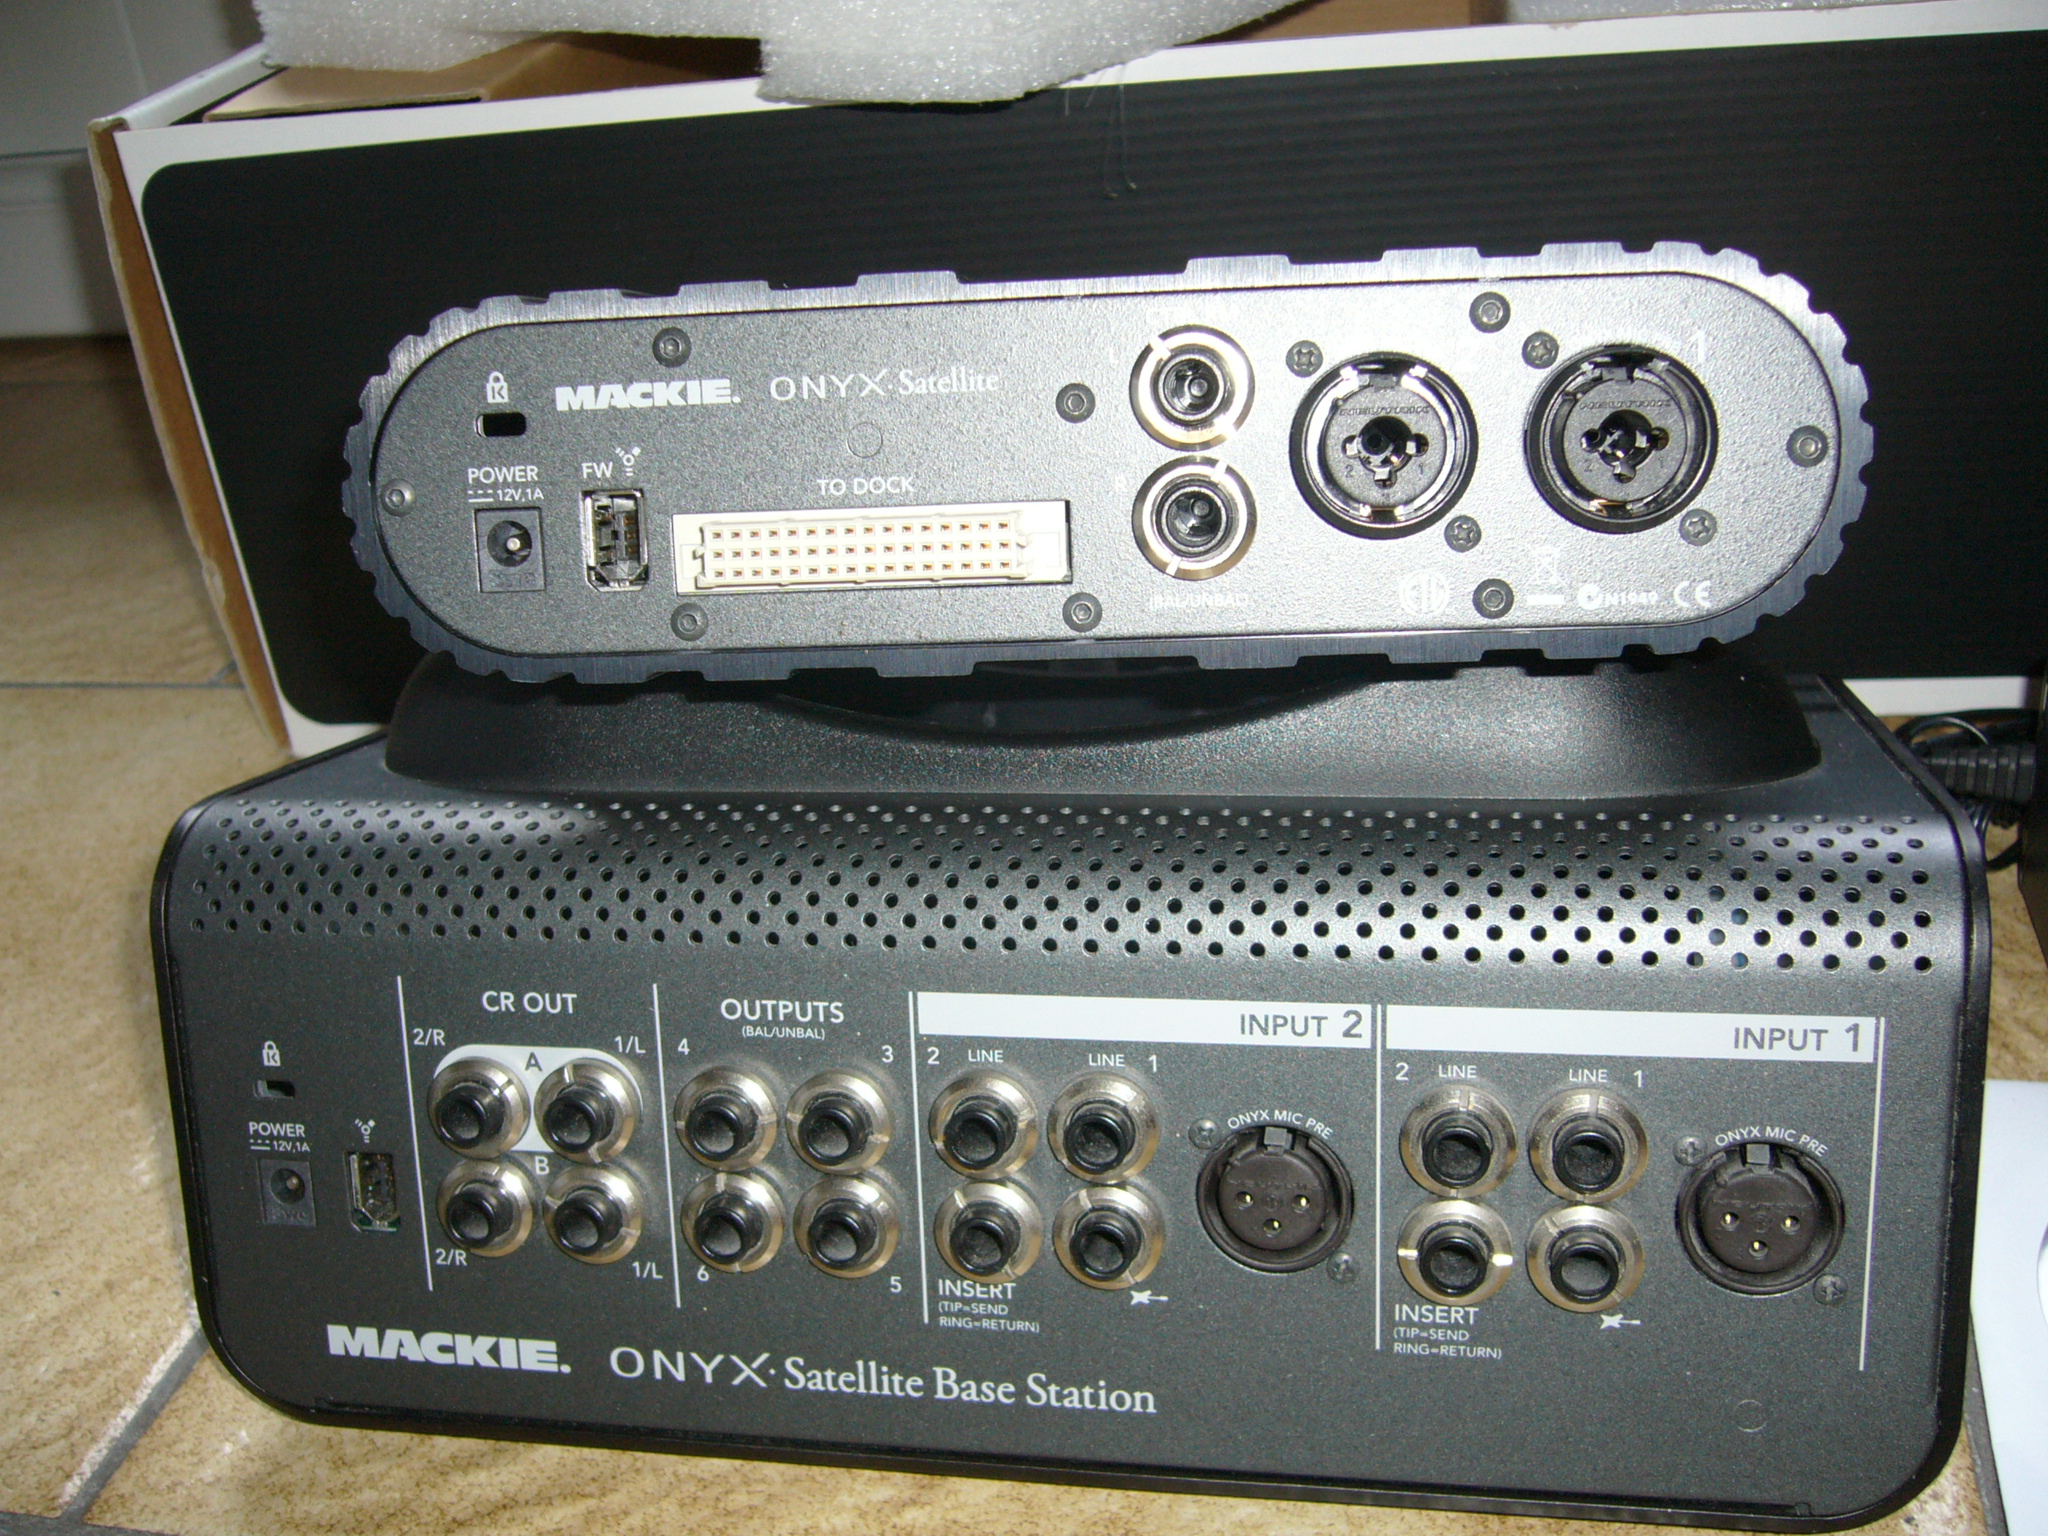 Mackie Onyx Satellite Driver For Windows Download Stepper Motor 74194